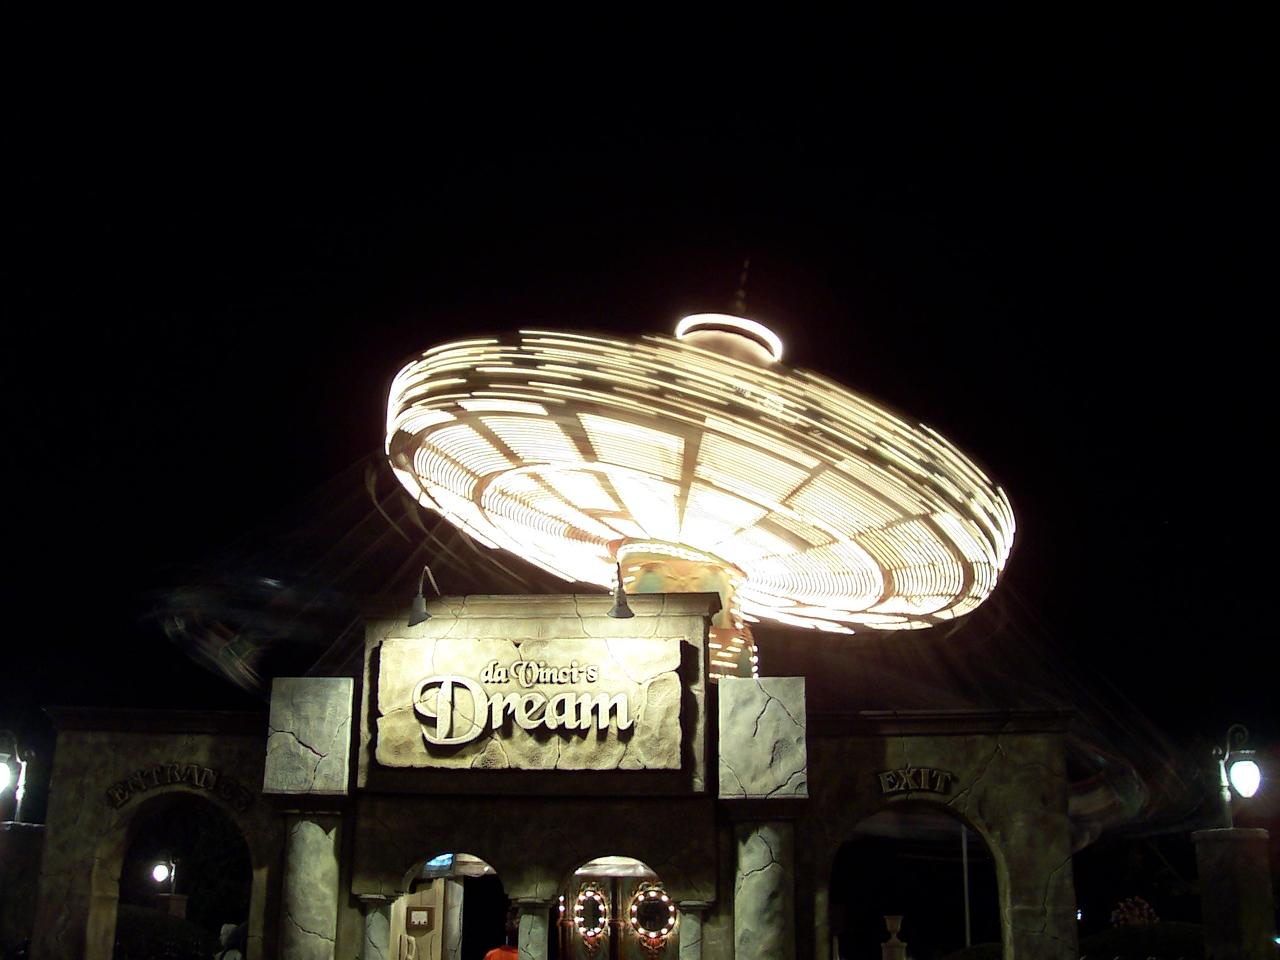 Da Vinci's Dream at night.